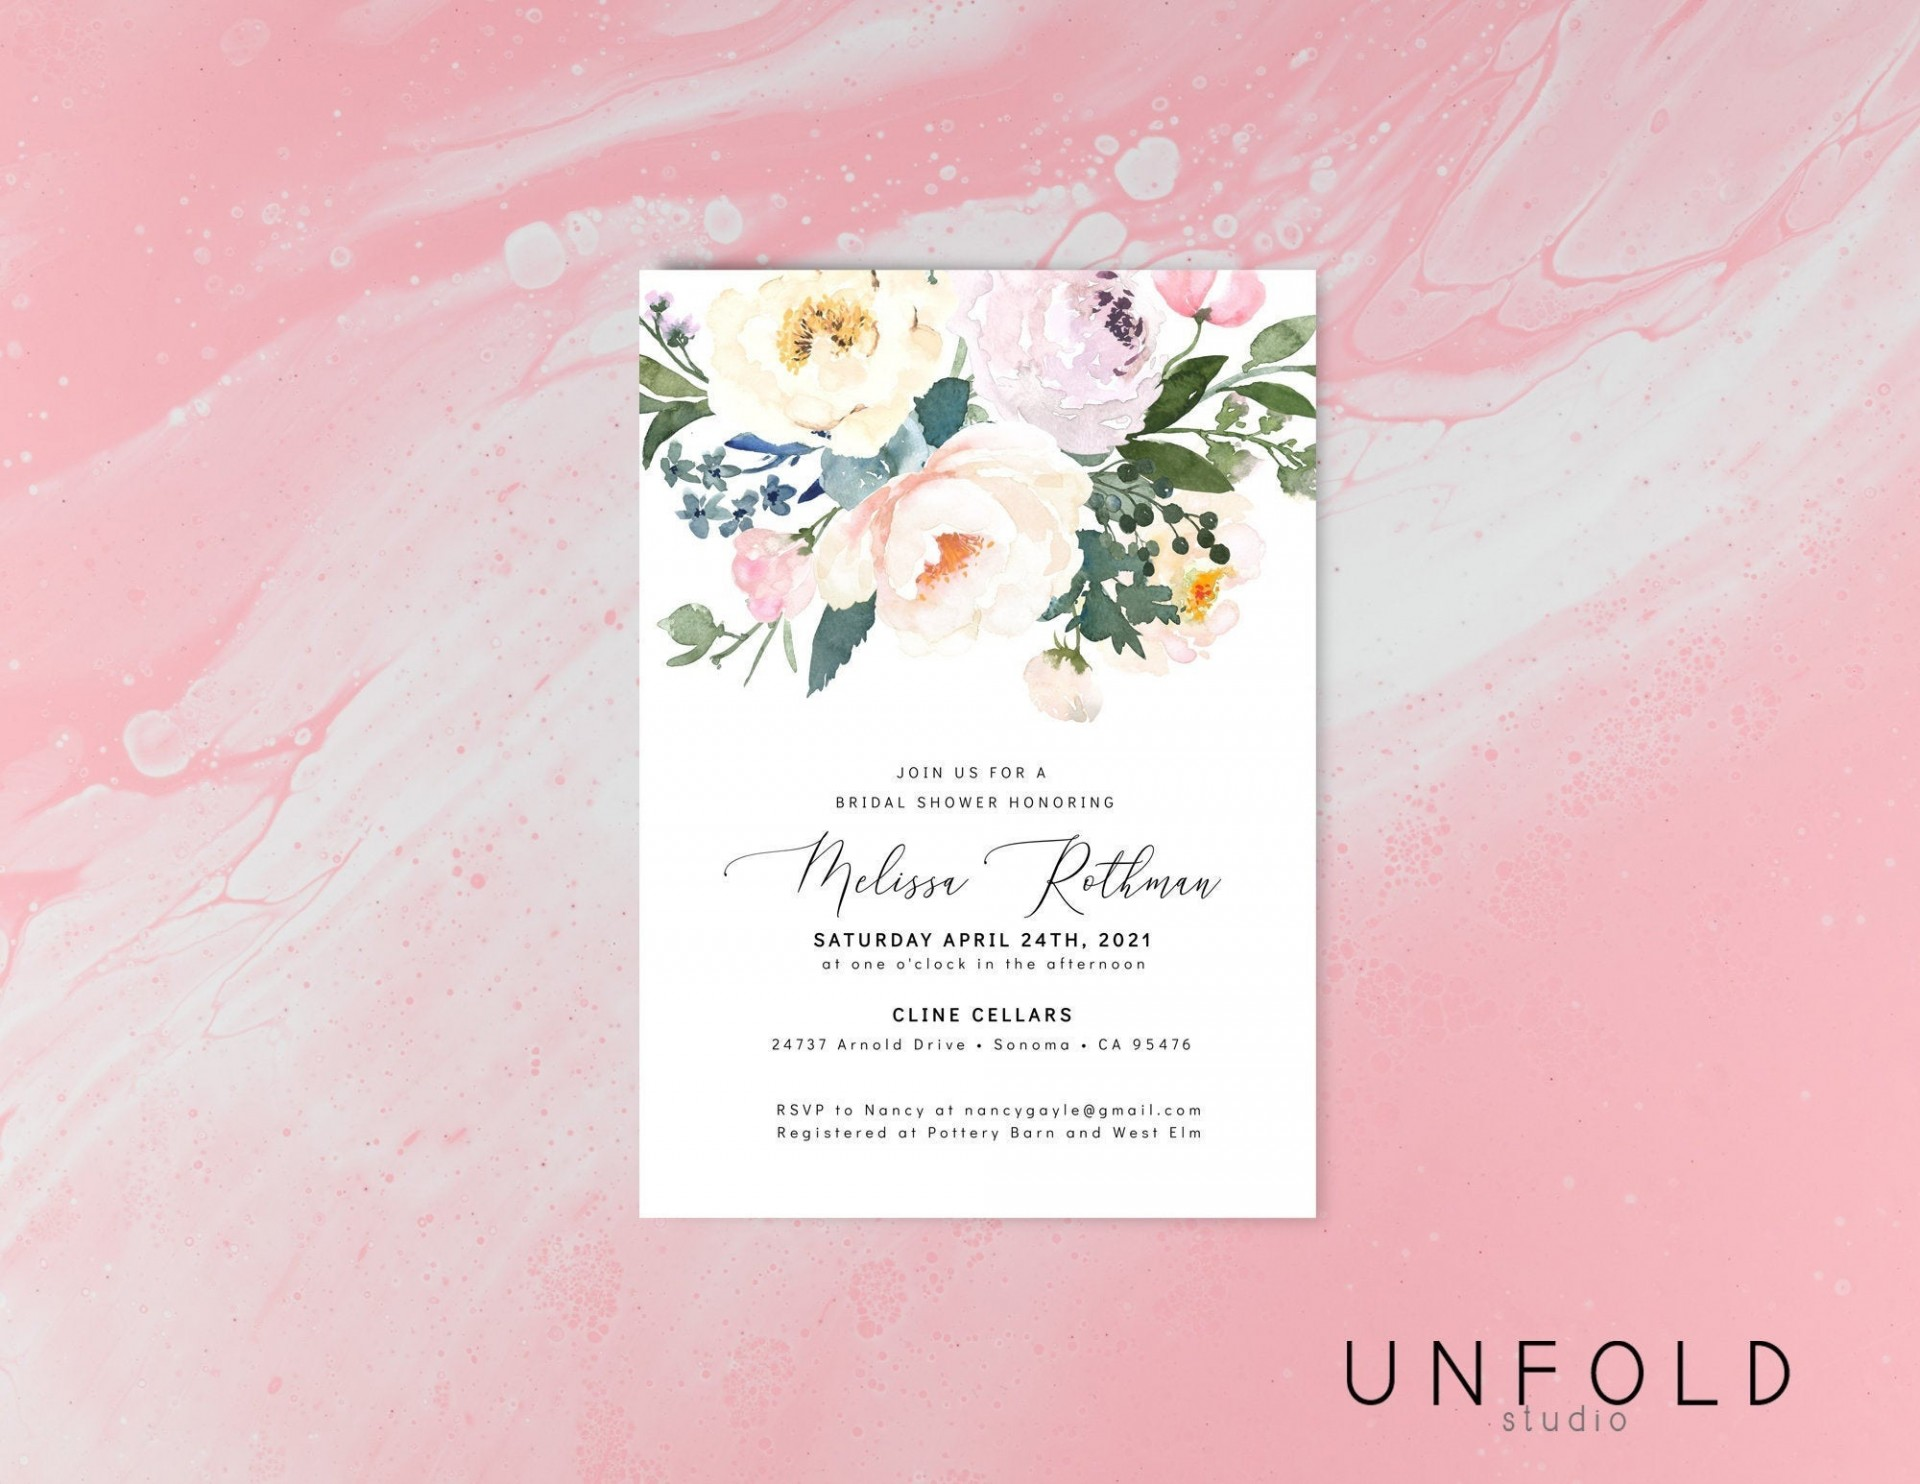 007 Stirring Bridal Shower Card Template Design  Invitation Free Download Bingo1920